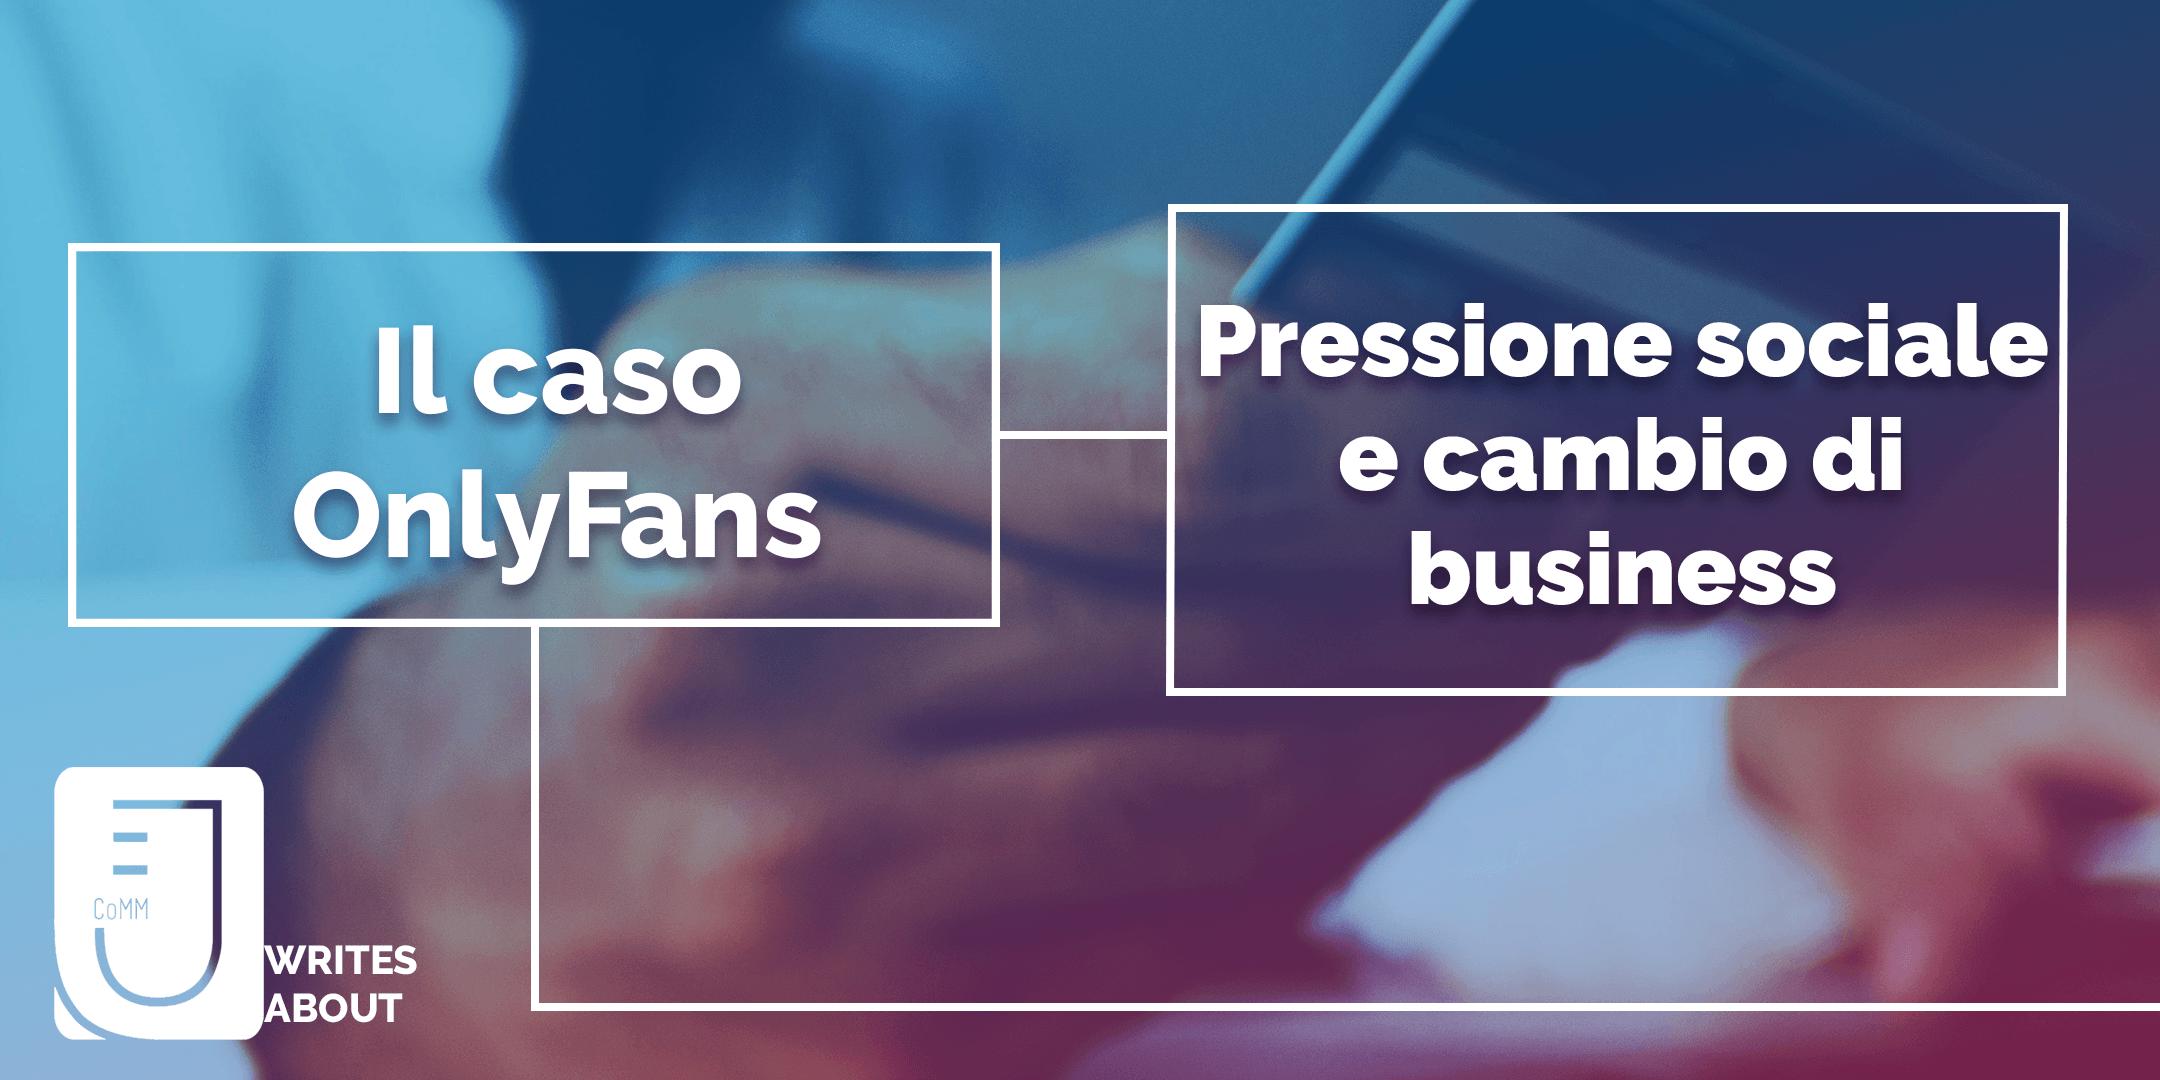 You are currently viewing Il caso OnlyFans: pressione sociale e cambio di business